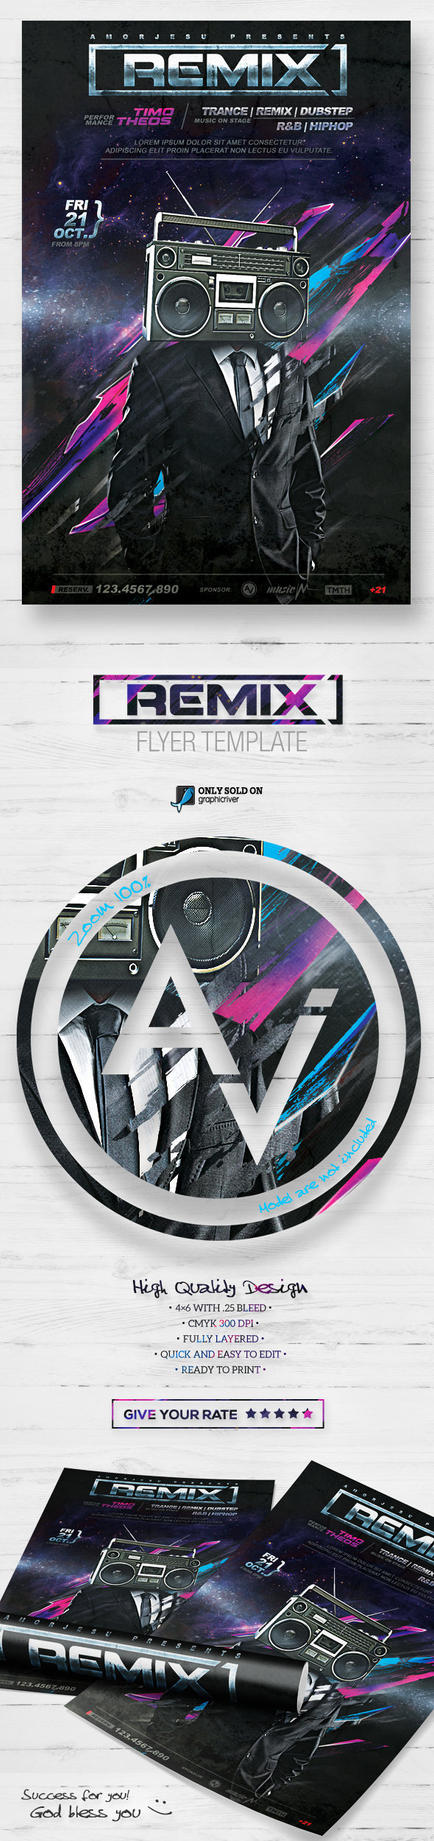 DJ Guest Flyer Template by amorjesu